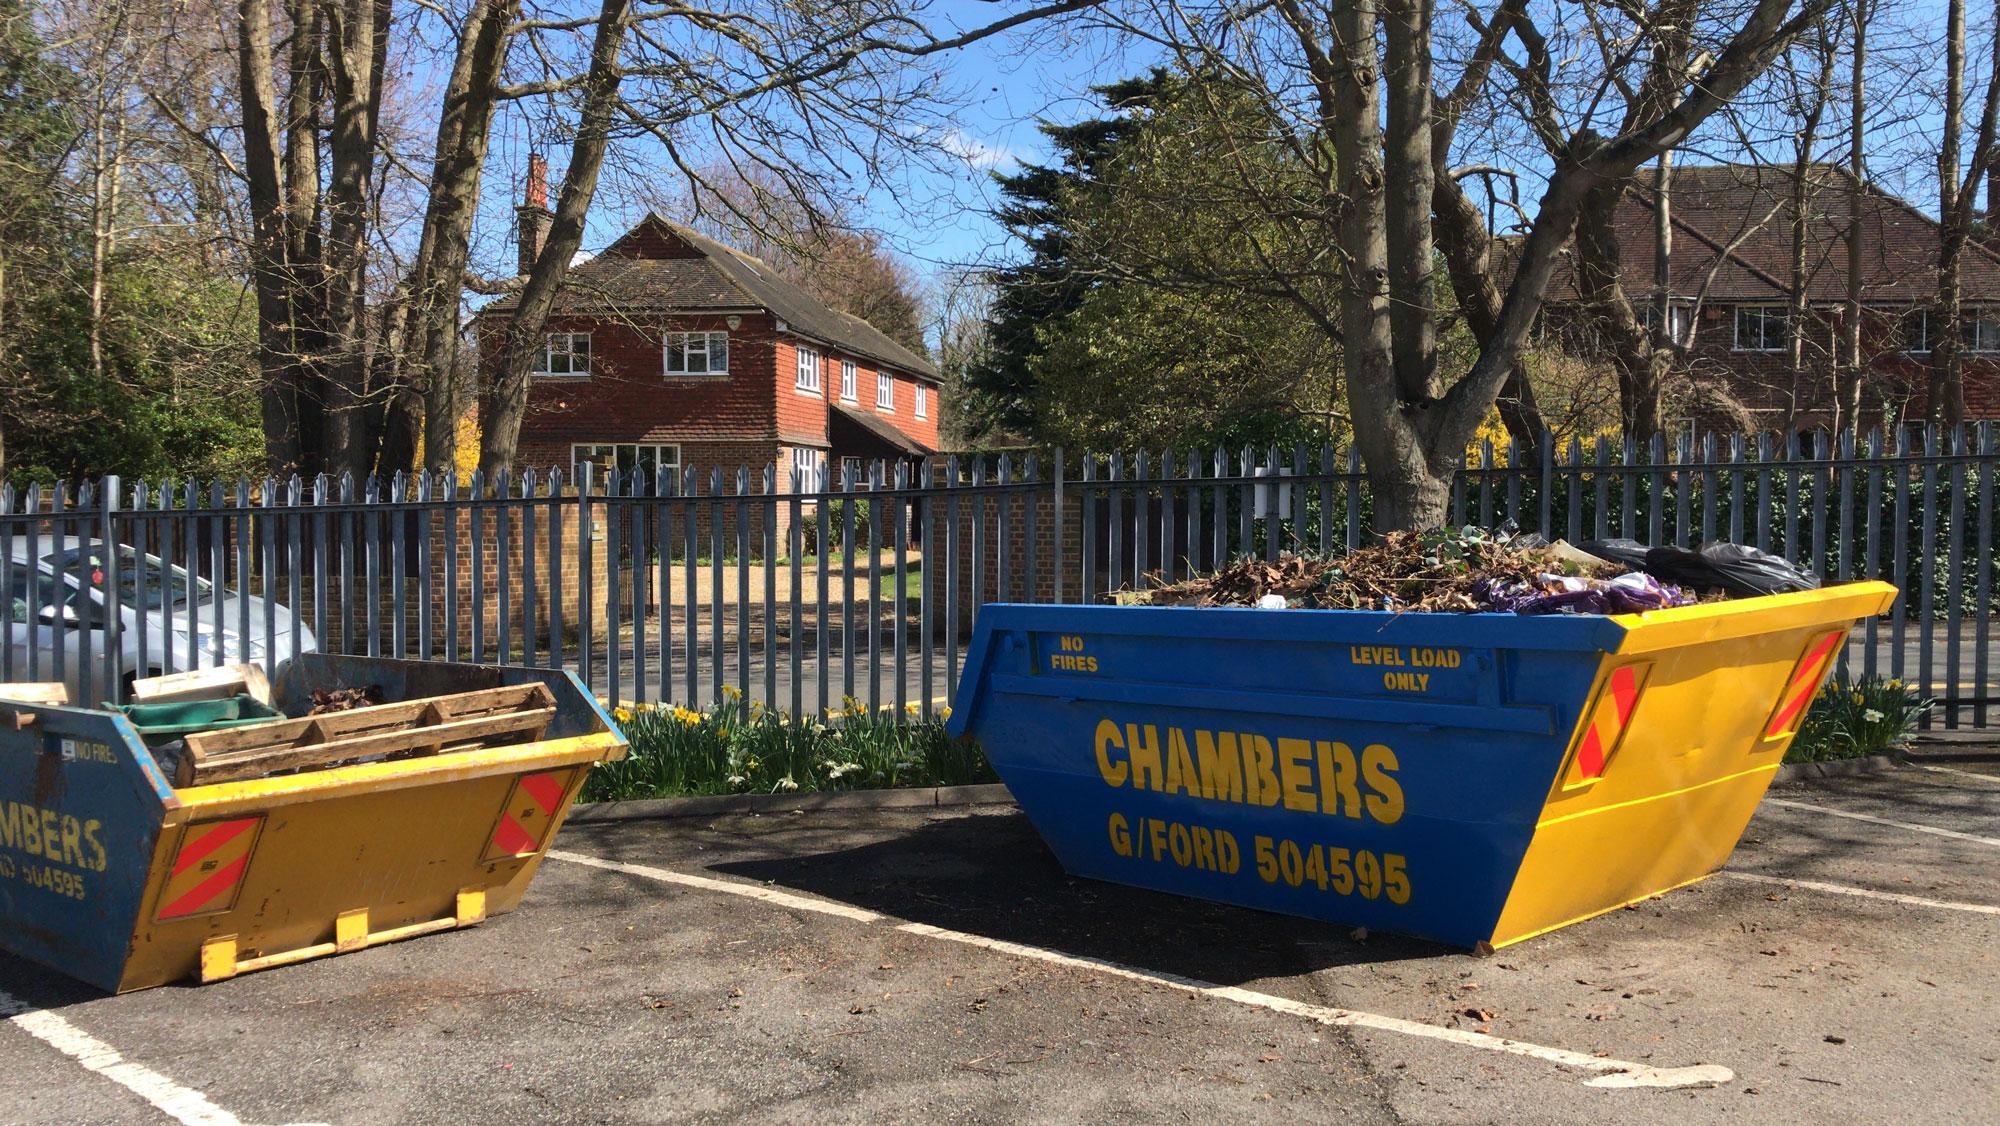 Chambers skips in use